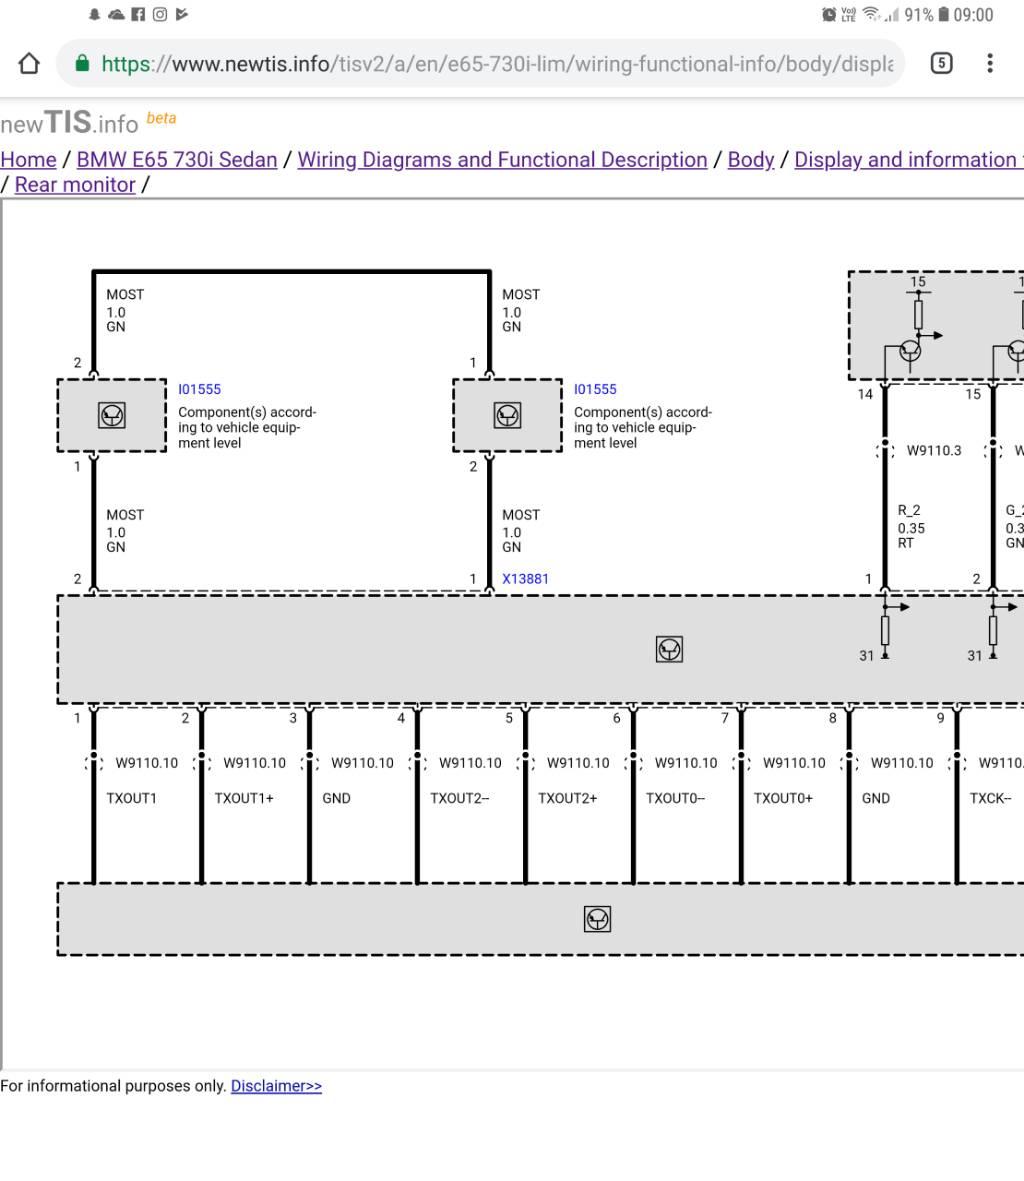 Click image for larger version  Name:Screenshot_20181123-090002_Chrome.jpeg Views:108 Size:84.4 KB ID:829251